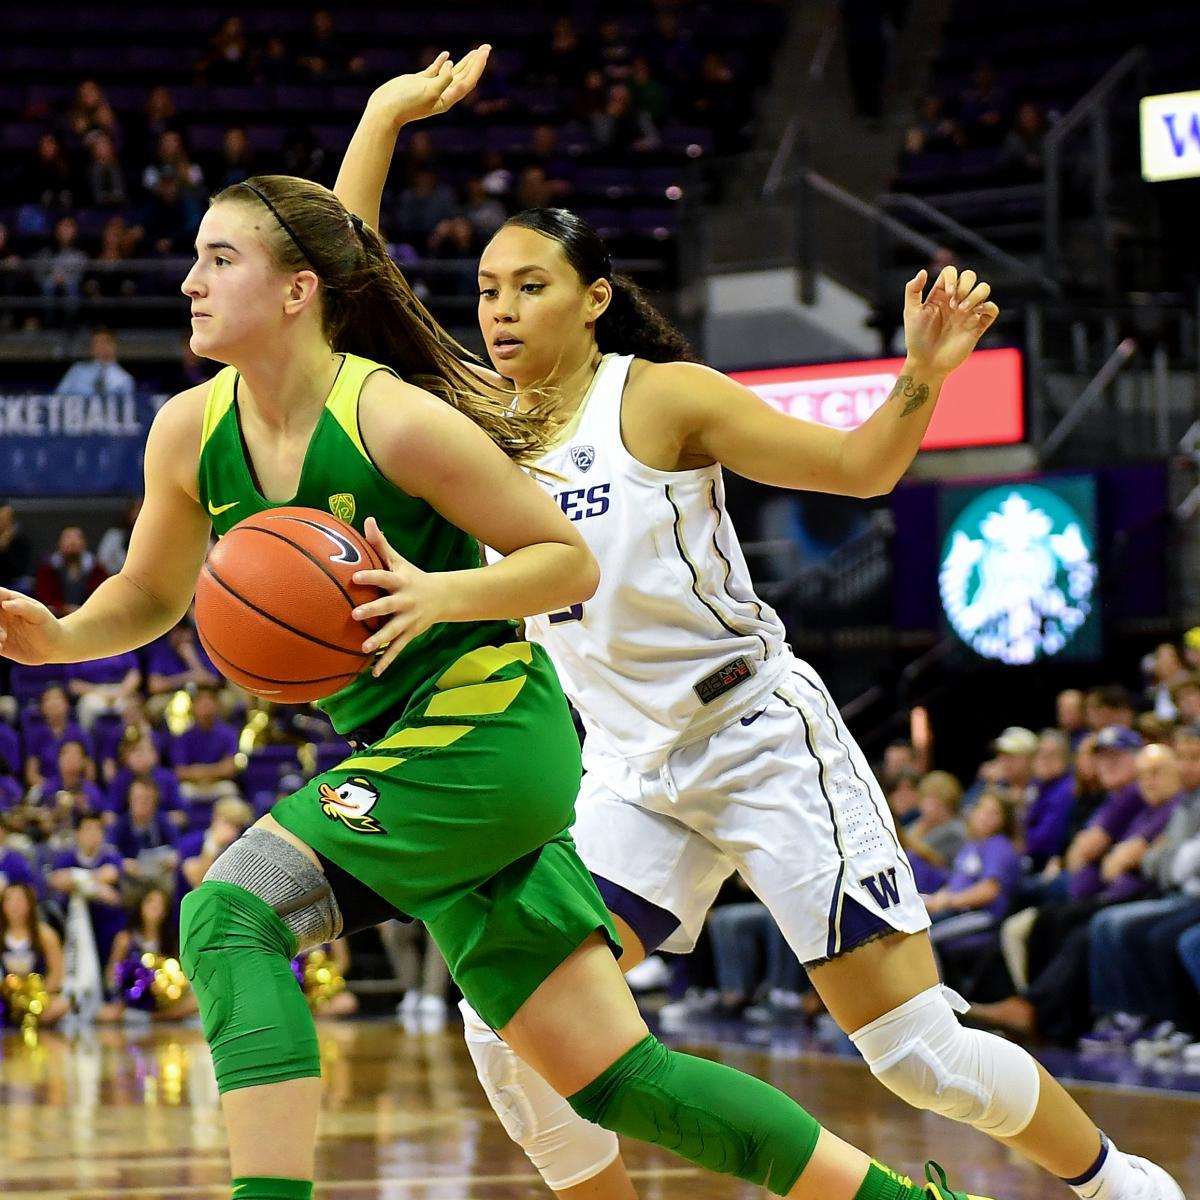 NCAA Women's Basketball Bracket 2019: Championship Odds